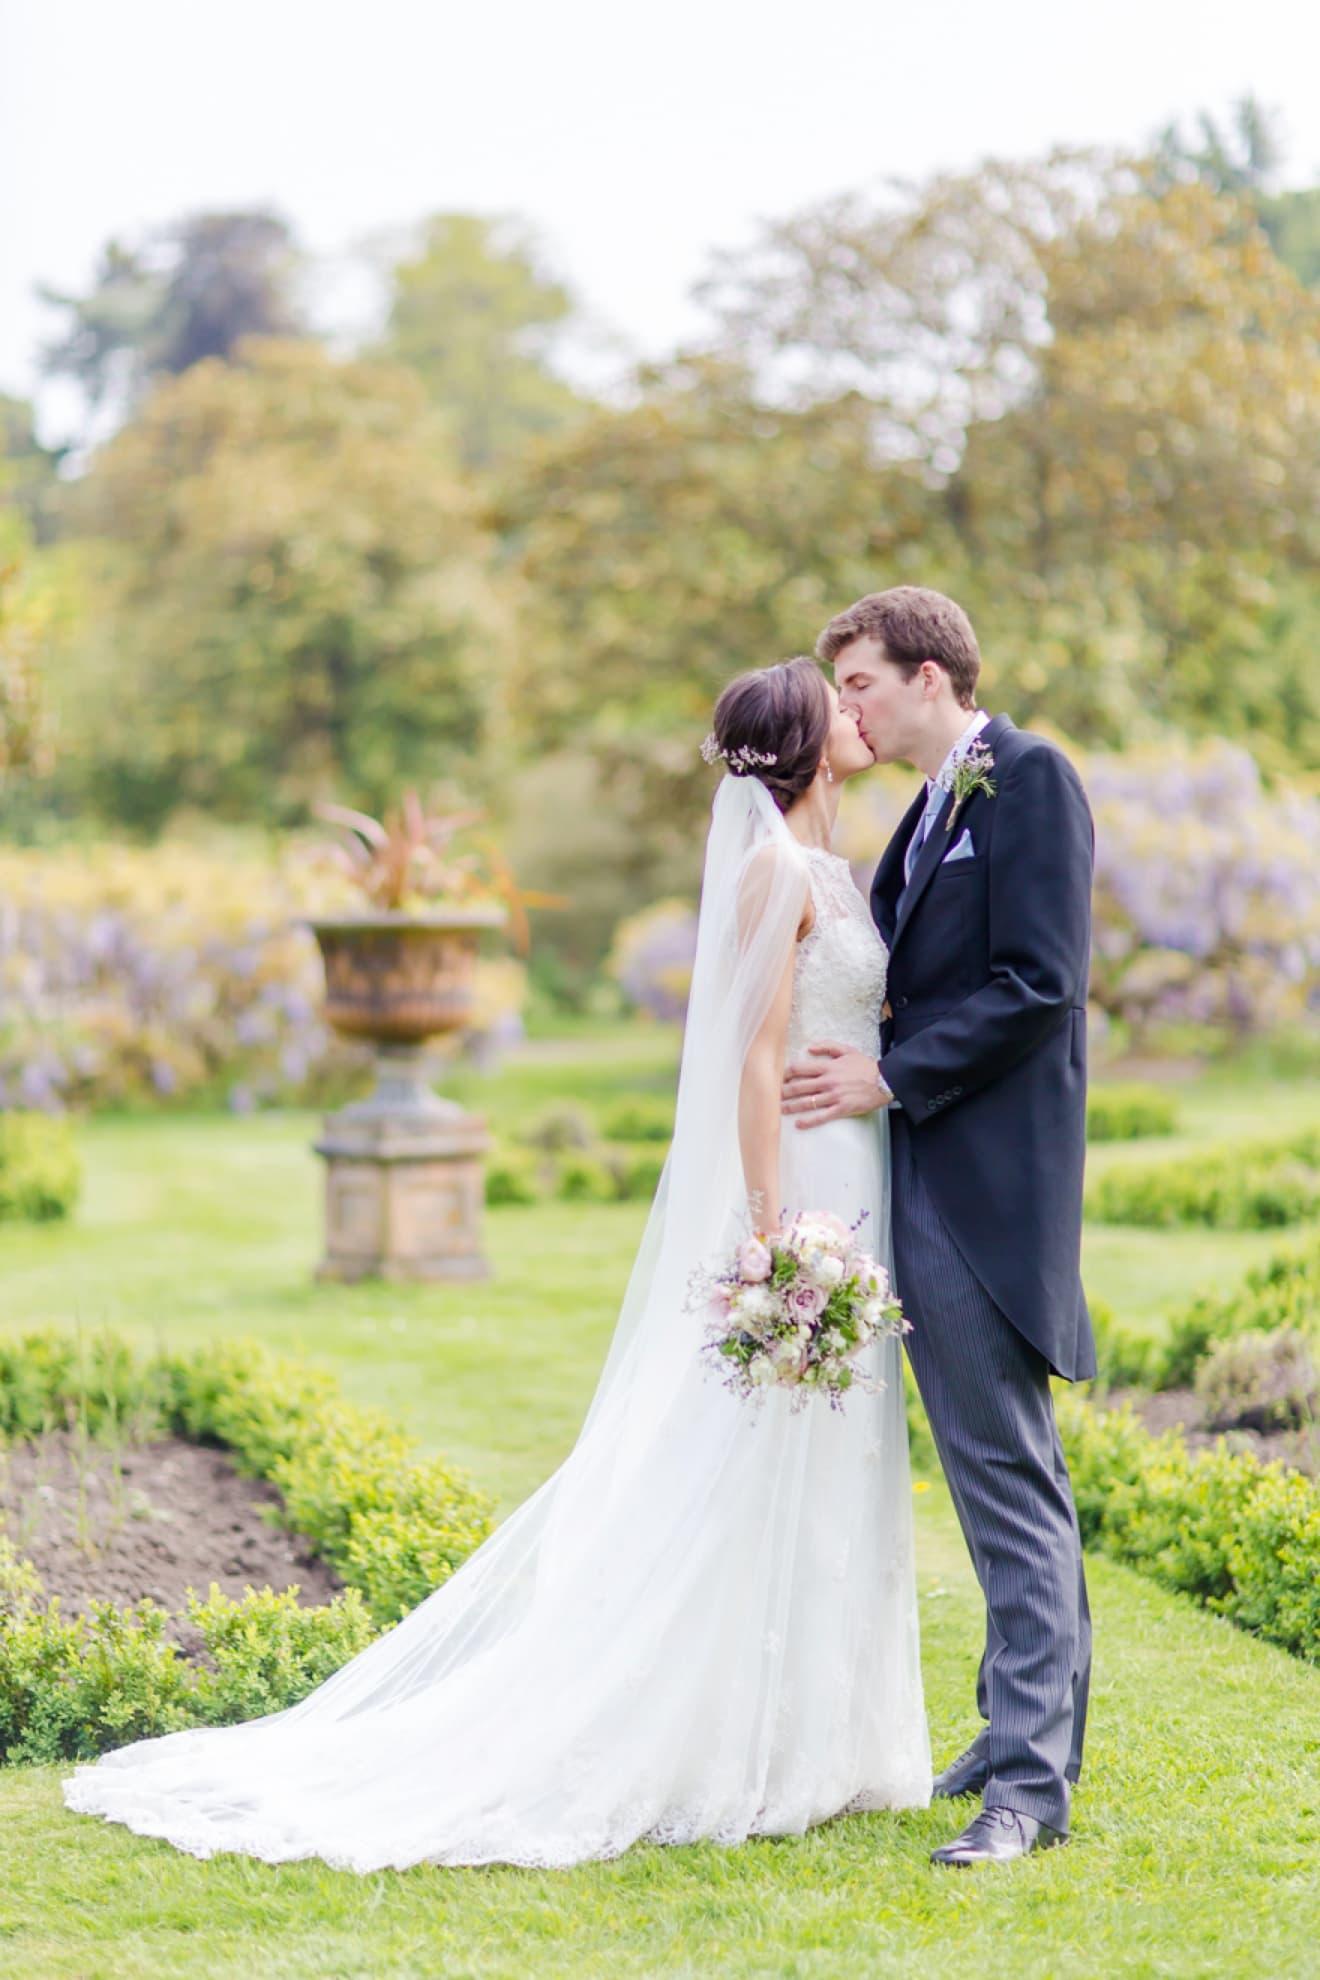 9-nonsuch-mansion-ali-tom-wedding-Eddie-Judd-Photography